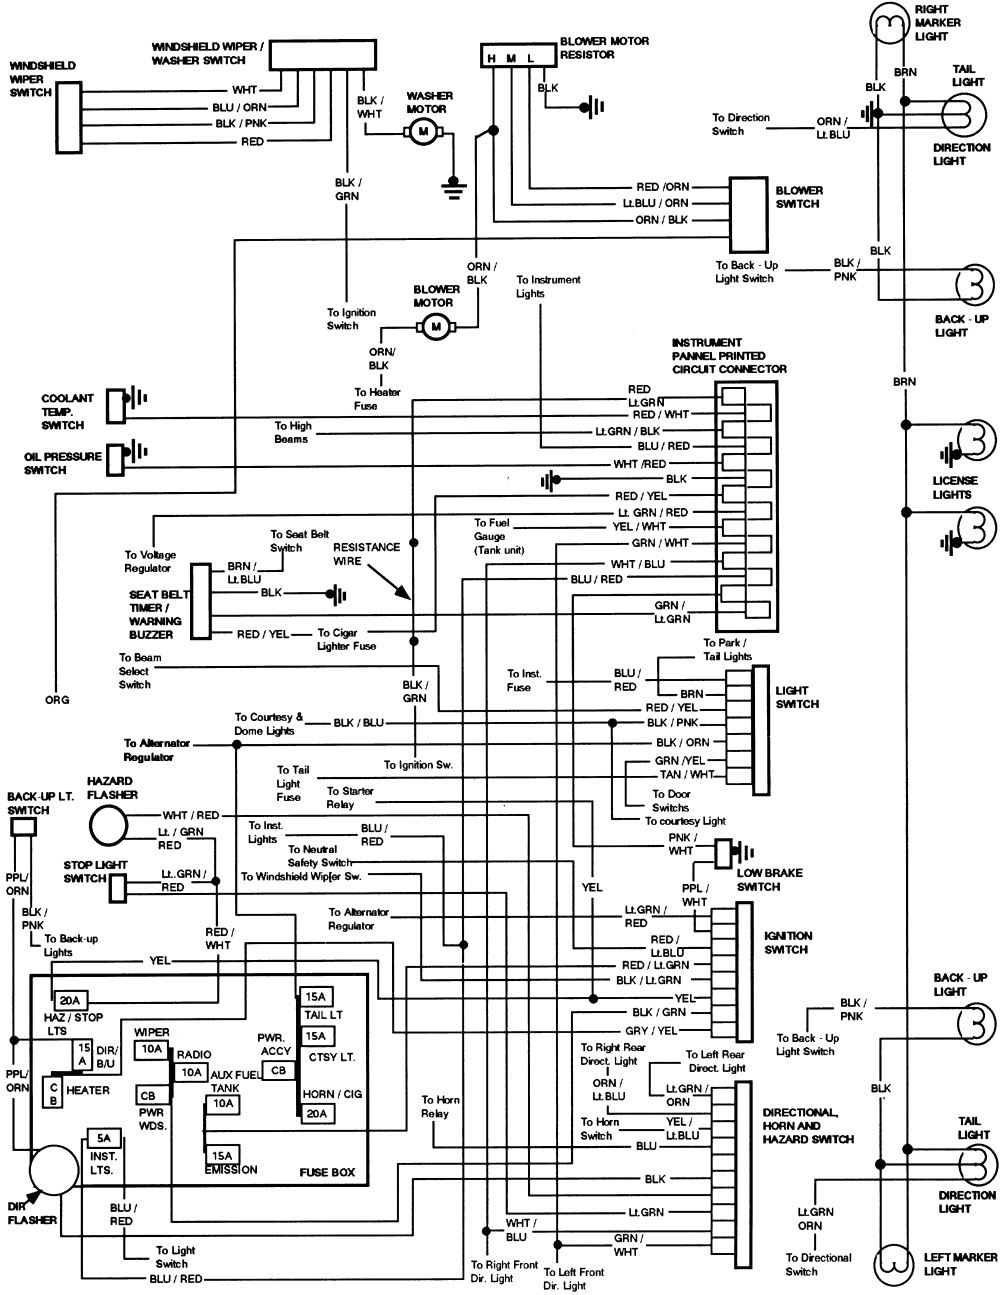 07 f150 wiring diagram